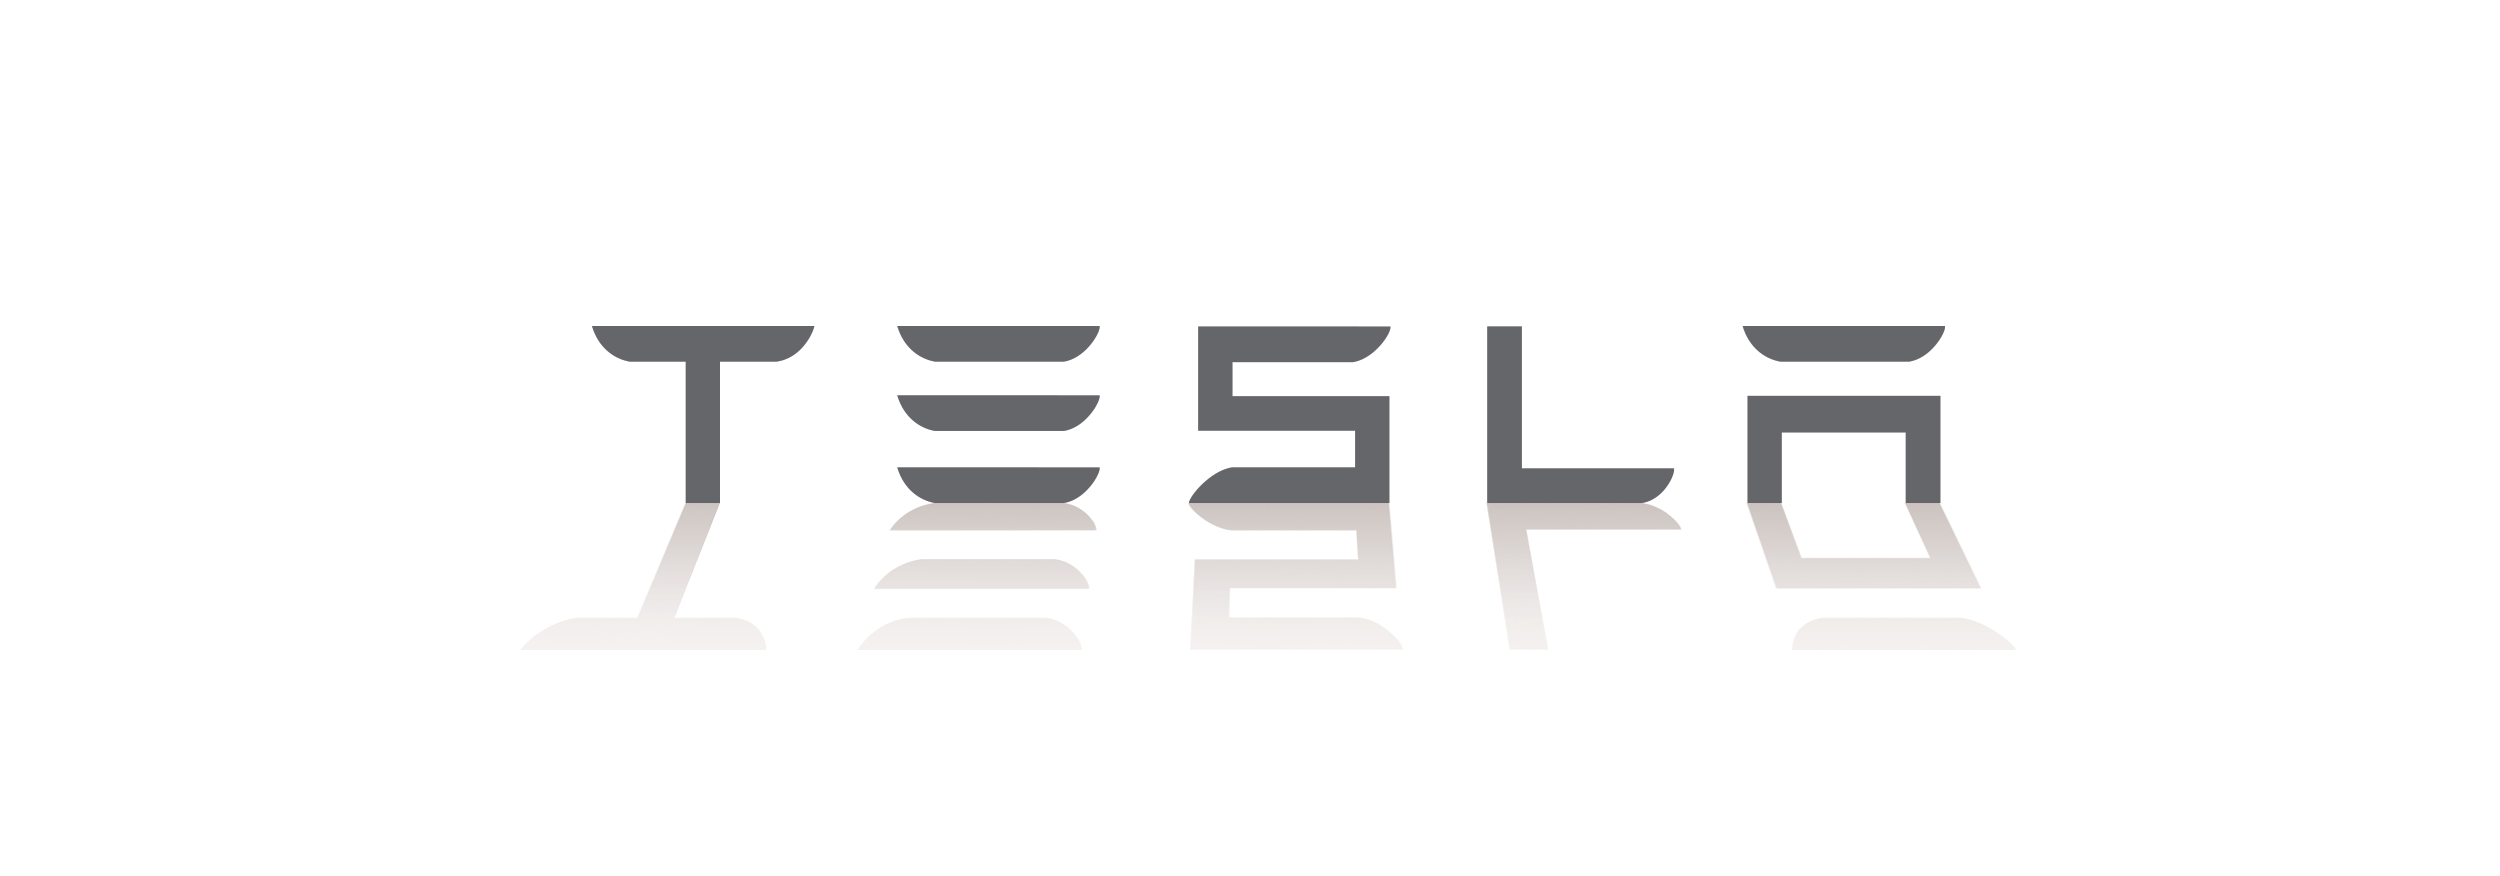 TeslaWebN_grey.png